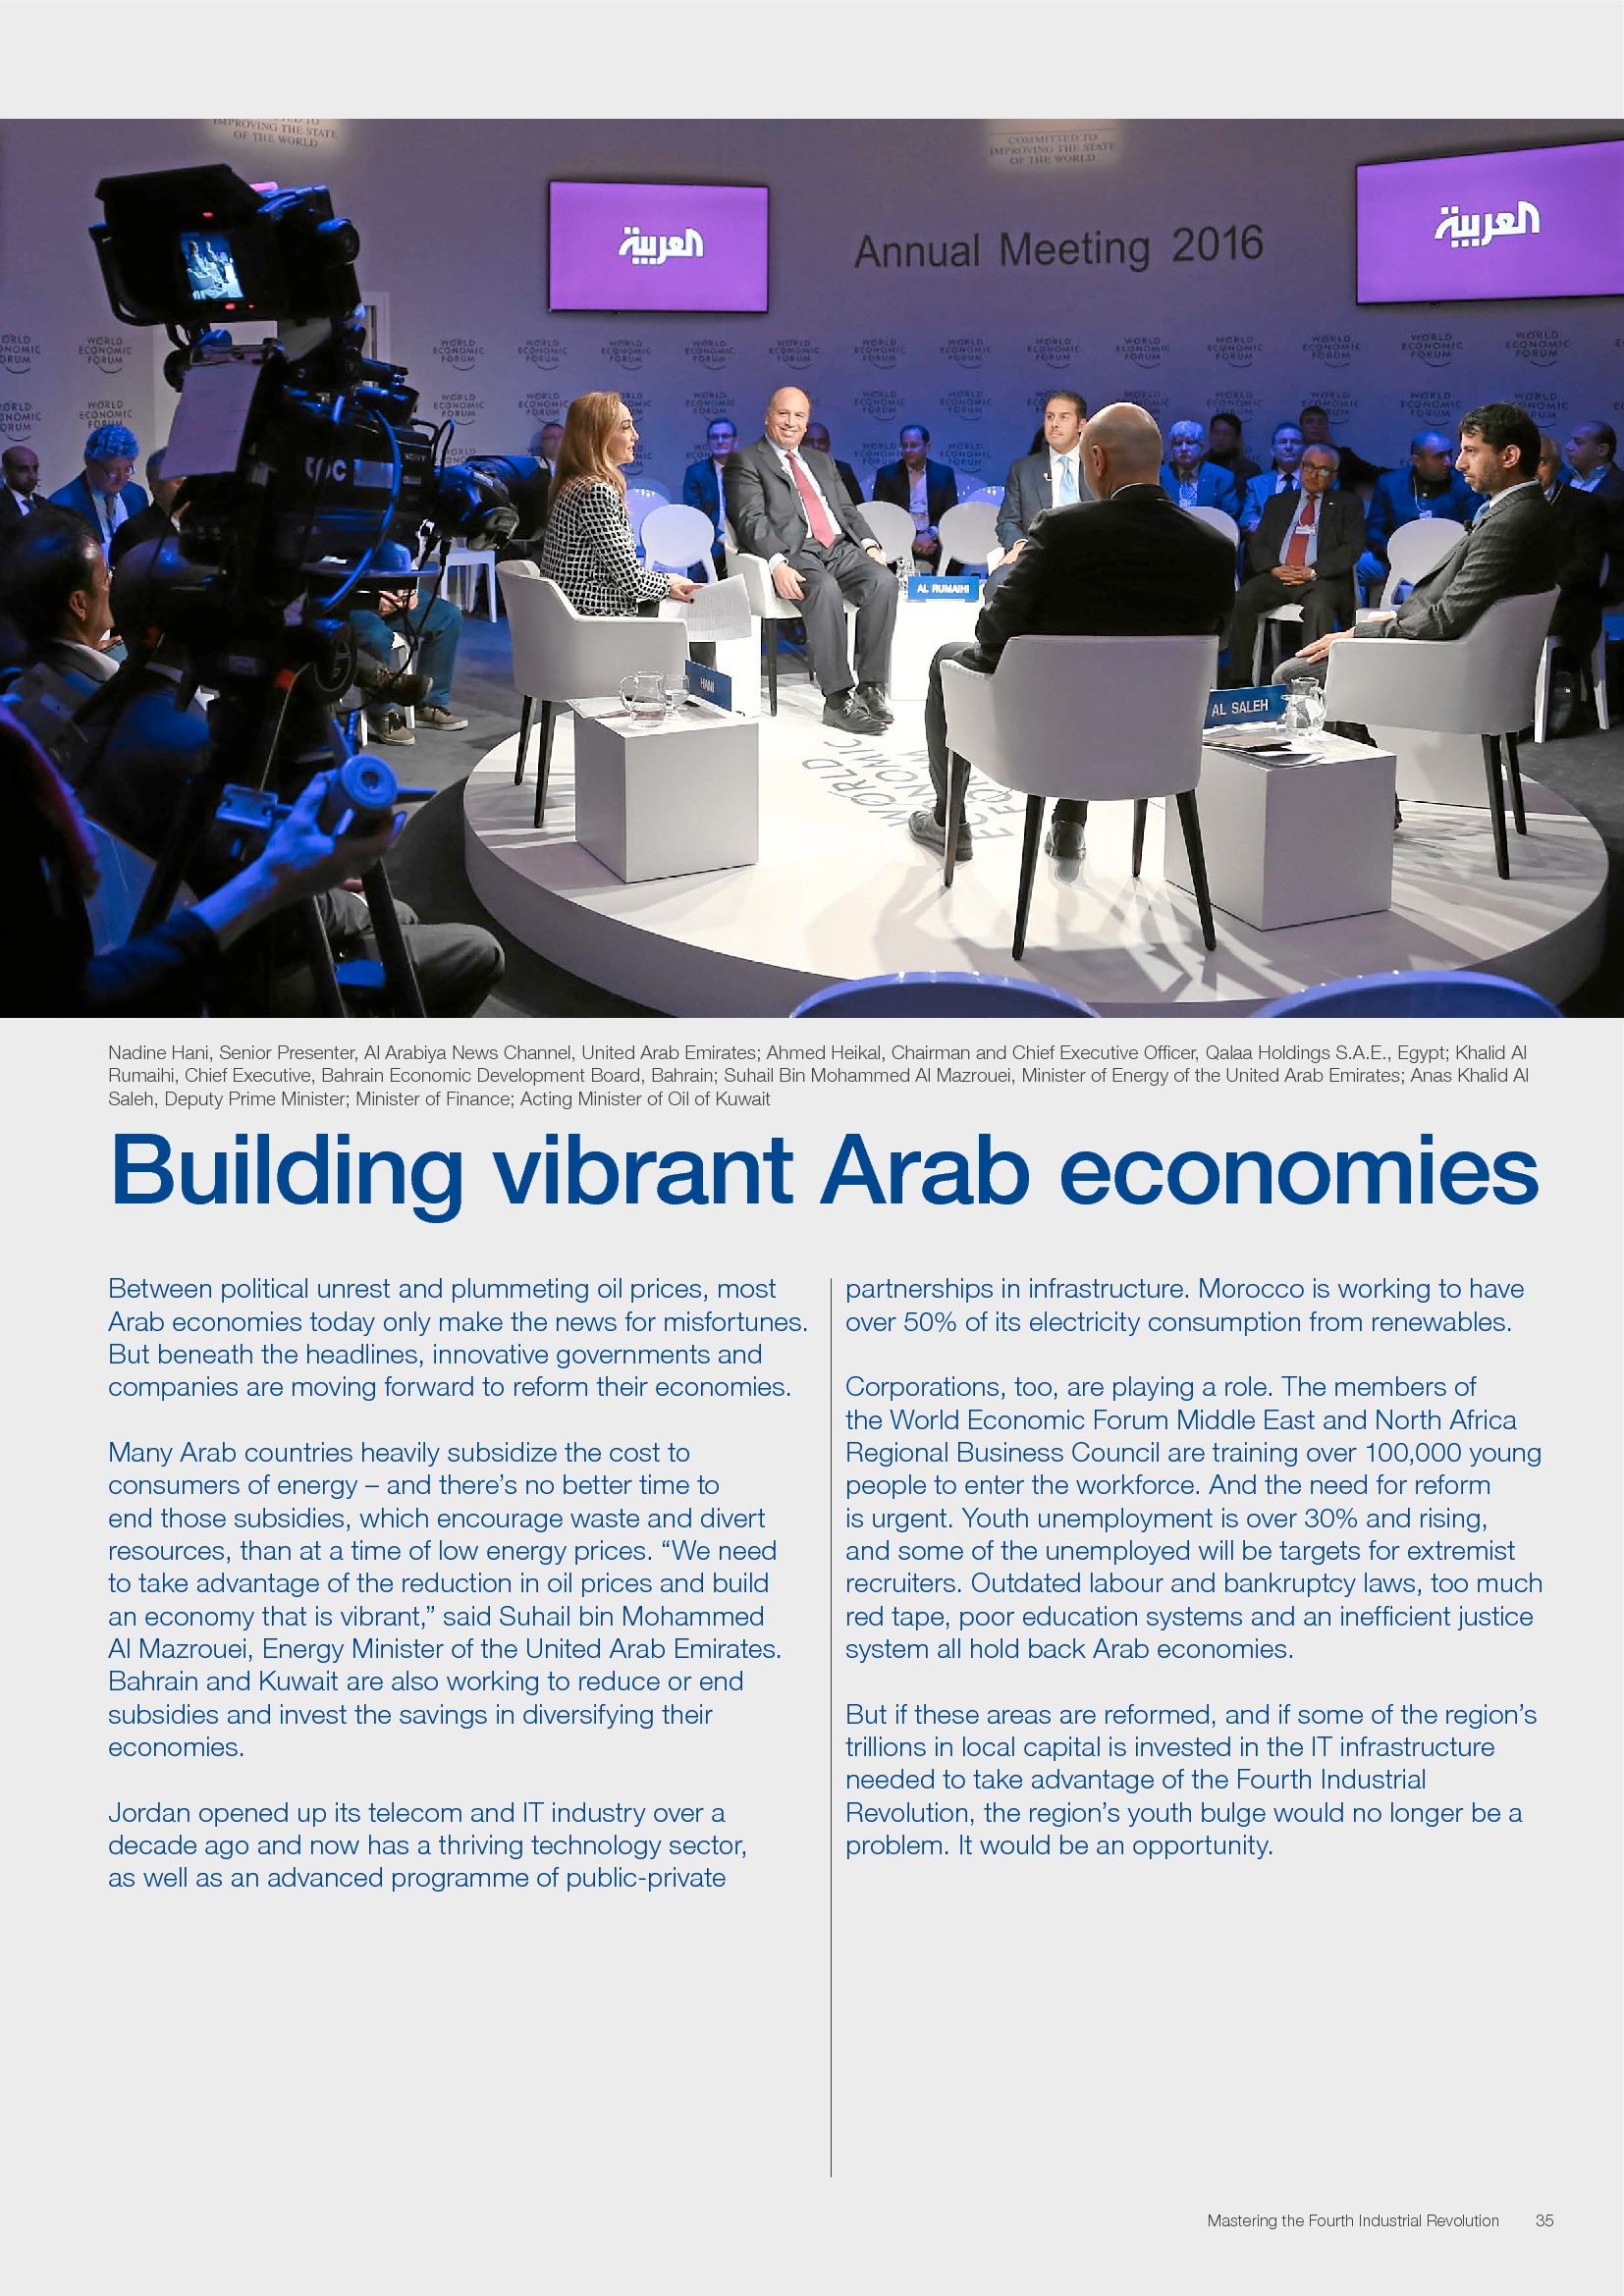 Advisorselect - World Economic Forum Annual Meeting 2016